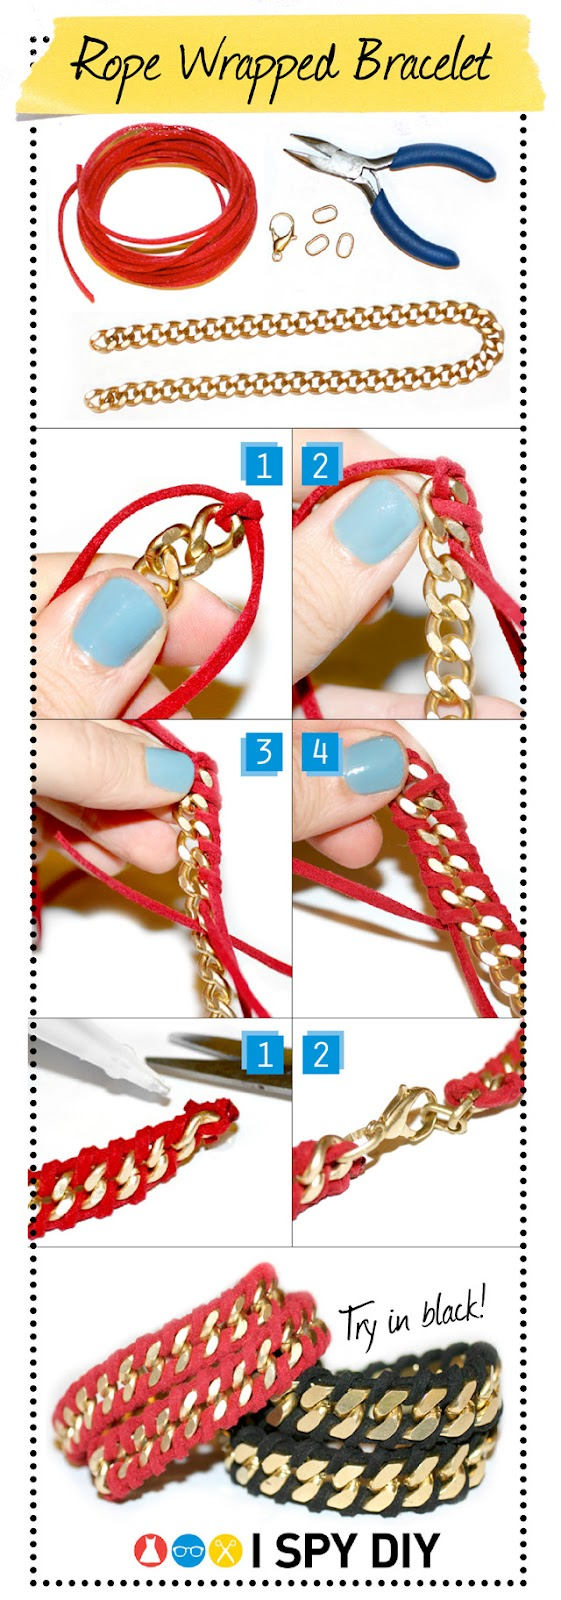 rope wrapped bracelet